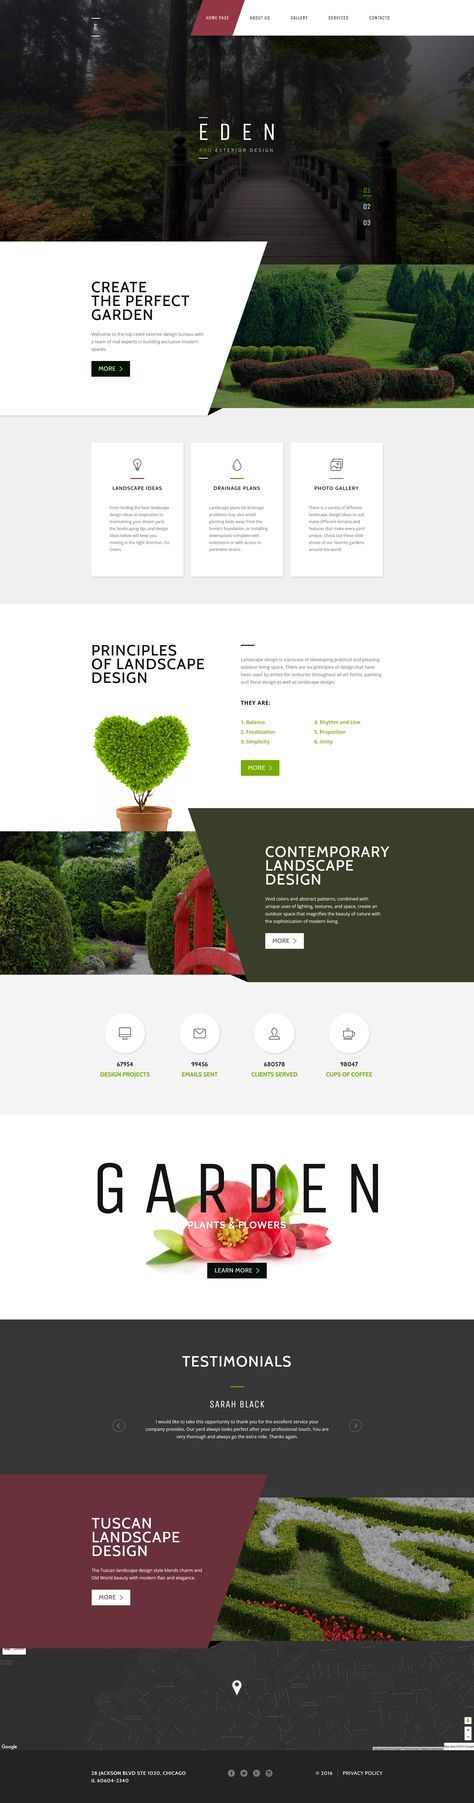 Garden Design Responsive Website Template 58440 Http Www Templatemonster Com Website Templates Garden D Web Design Website Design Website Design Inspiration